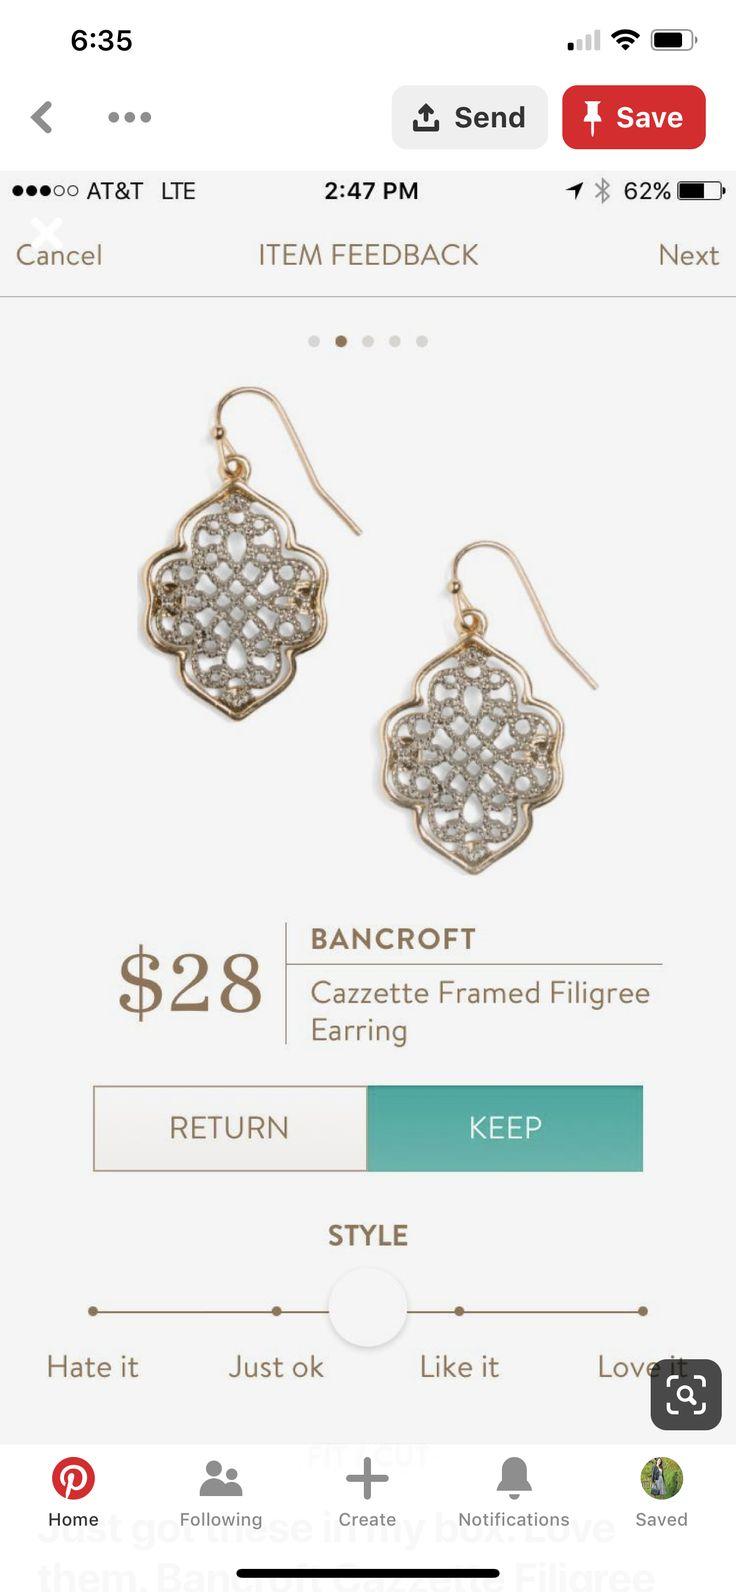 Stitch Fix jewelry and accessories   Stitch Fix Bancroft Cazzette Framed Filigree Earrings